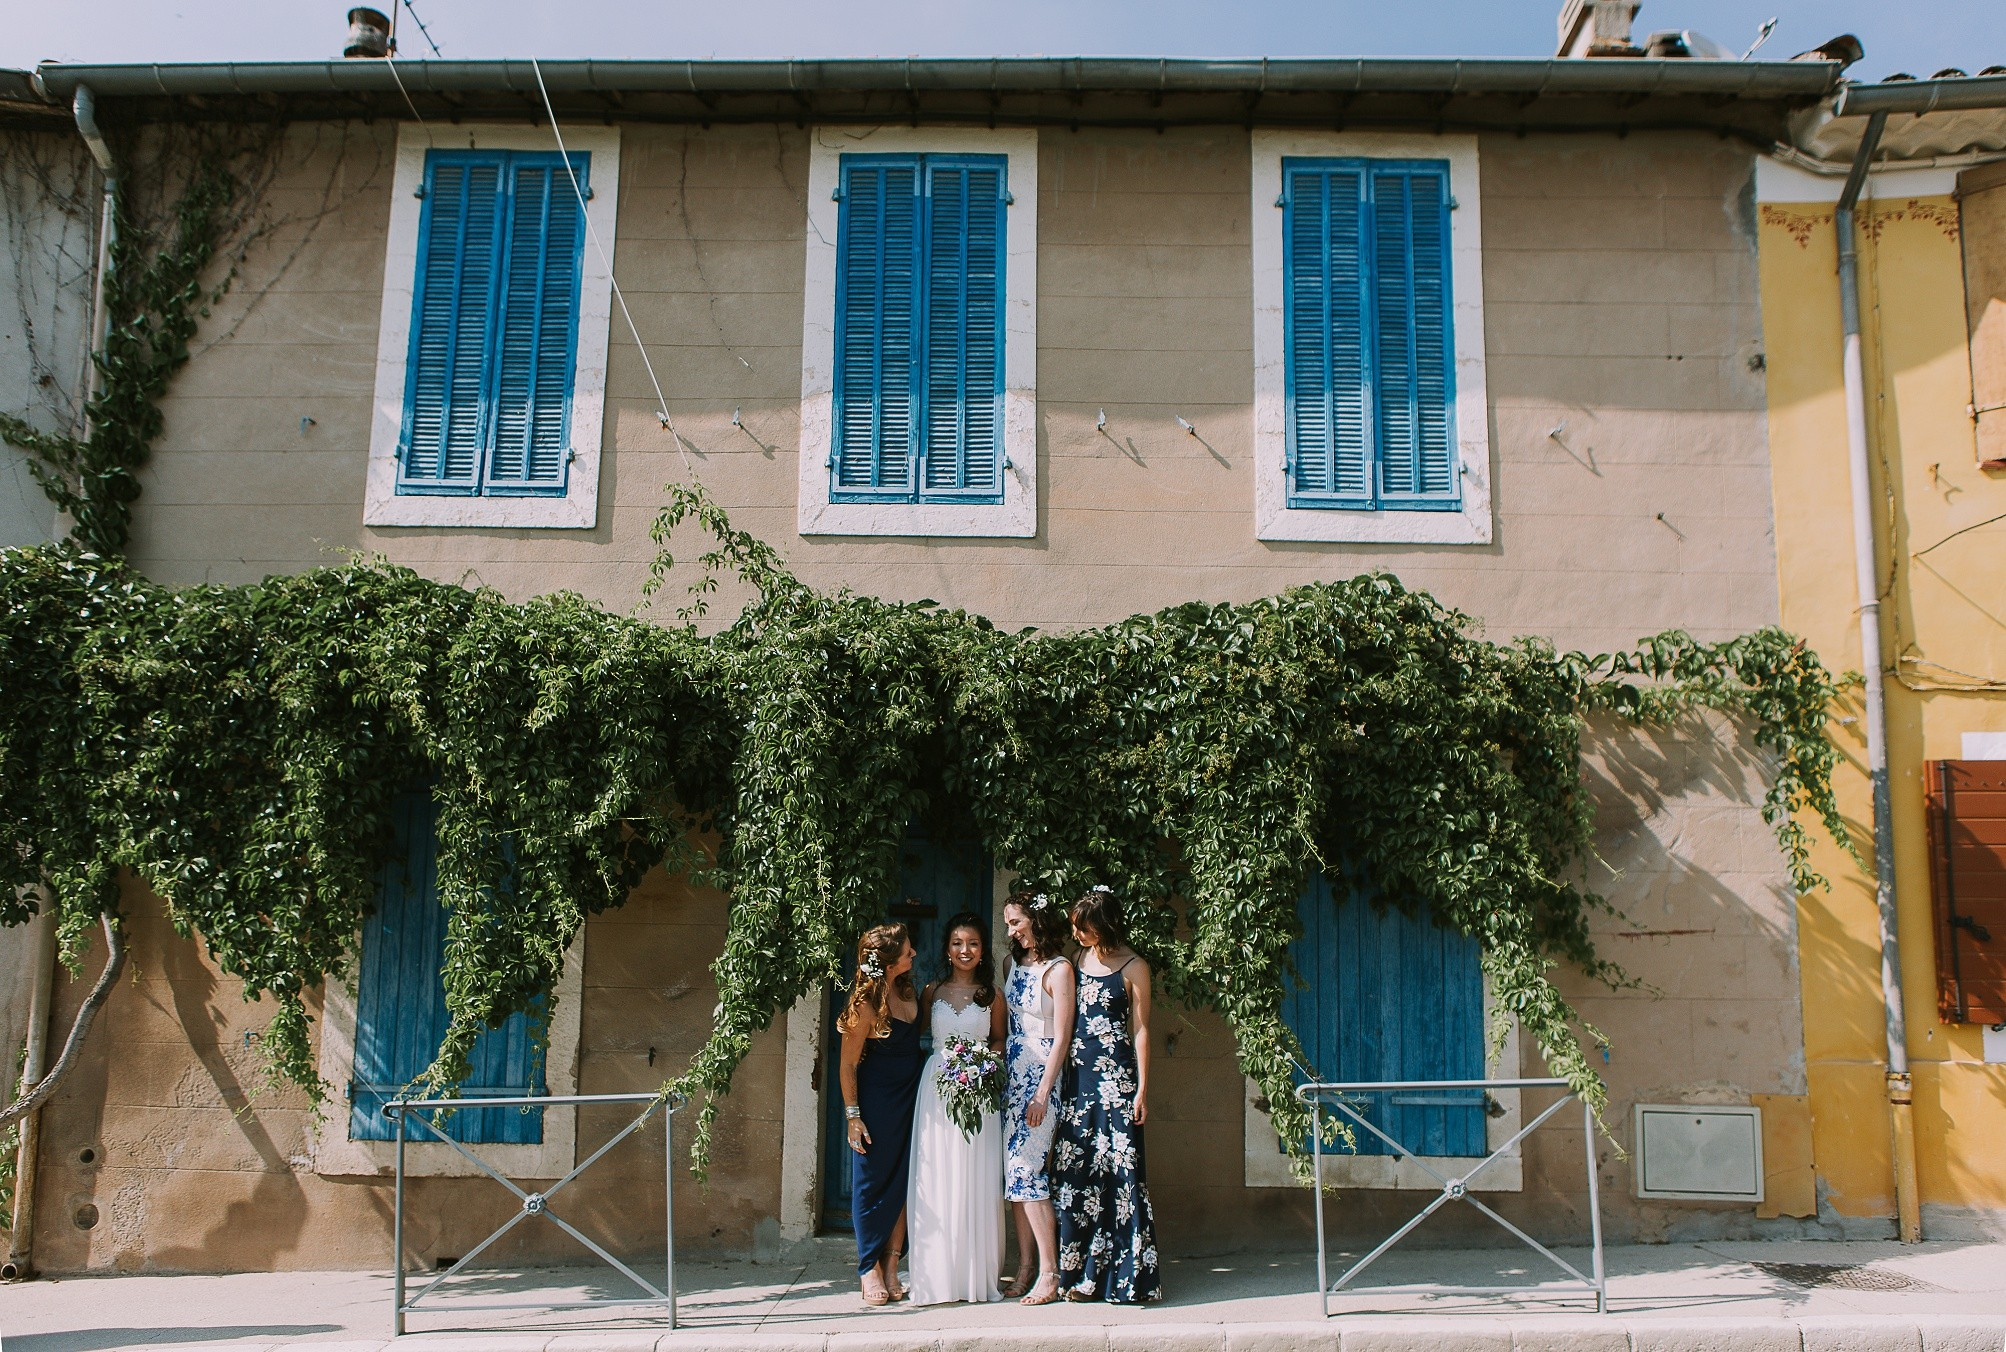 katerynaphotos-mariage-photographe-puyloubier-provence-aix-en-provence-sud-de-la-france_0377.jpg